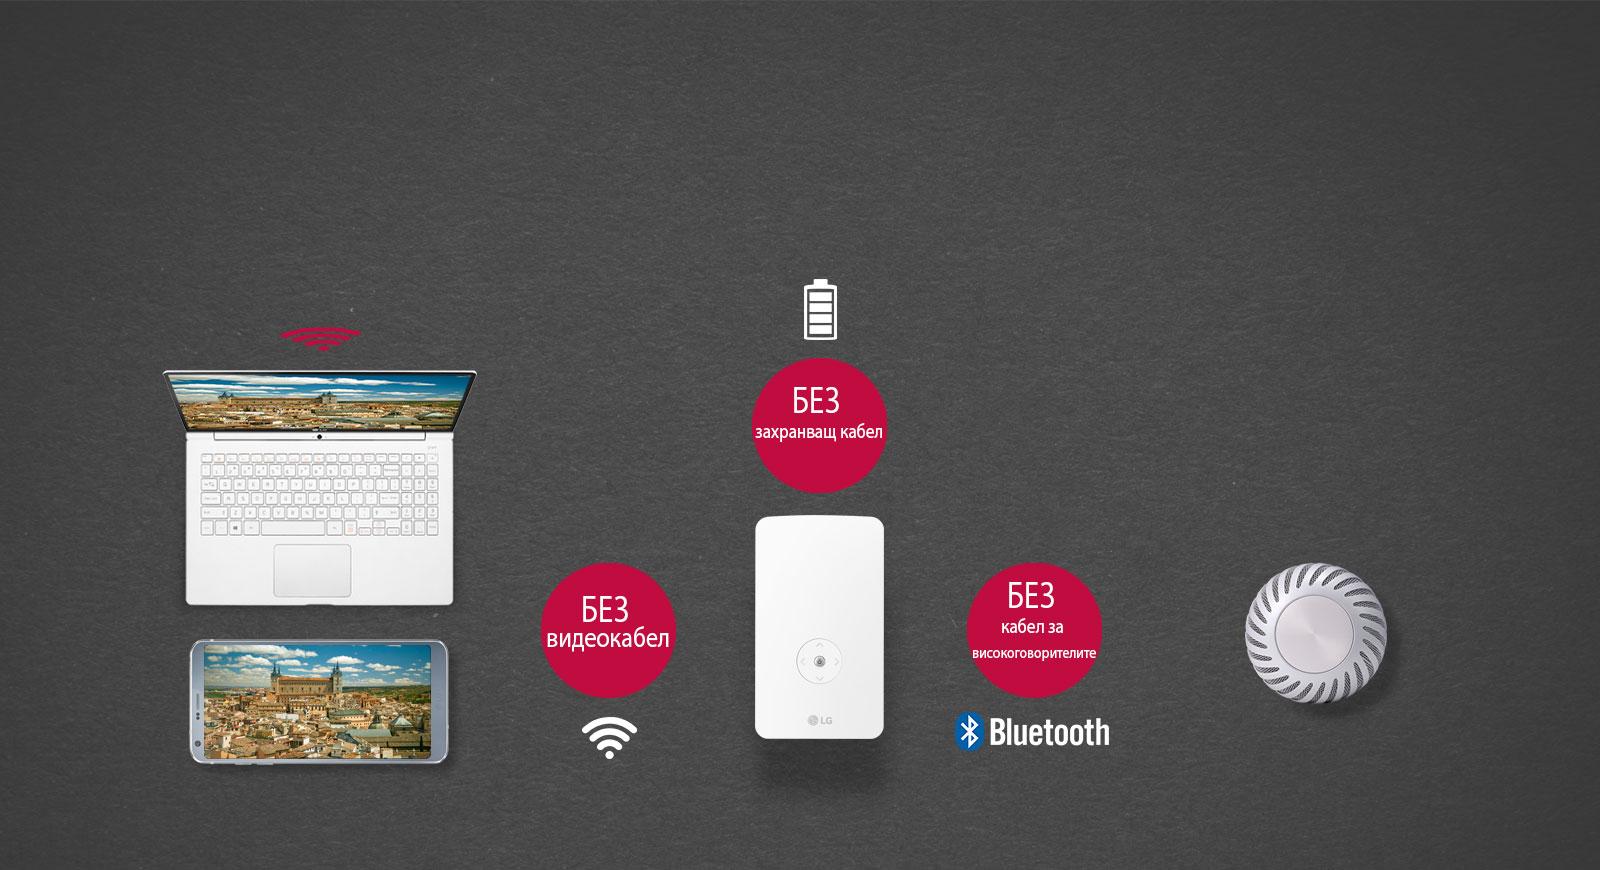 02_PH30JG_Triple-Wireless_D